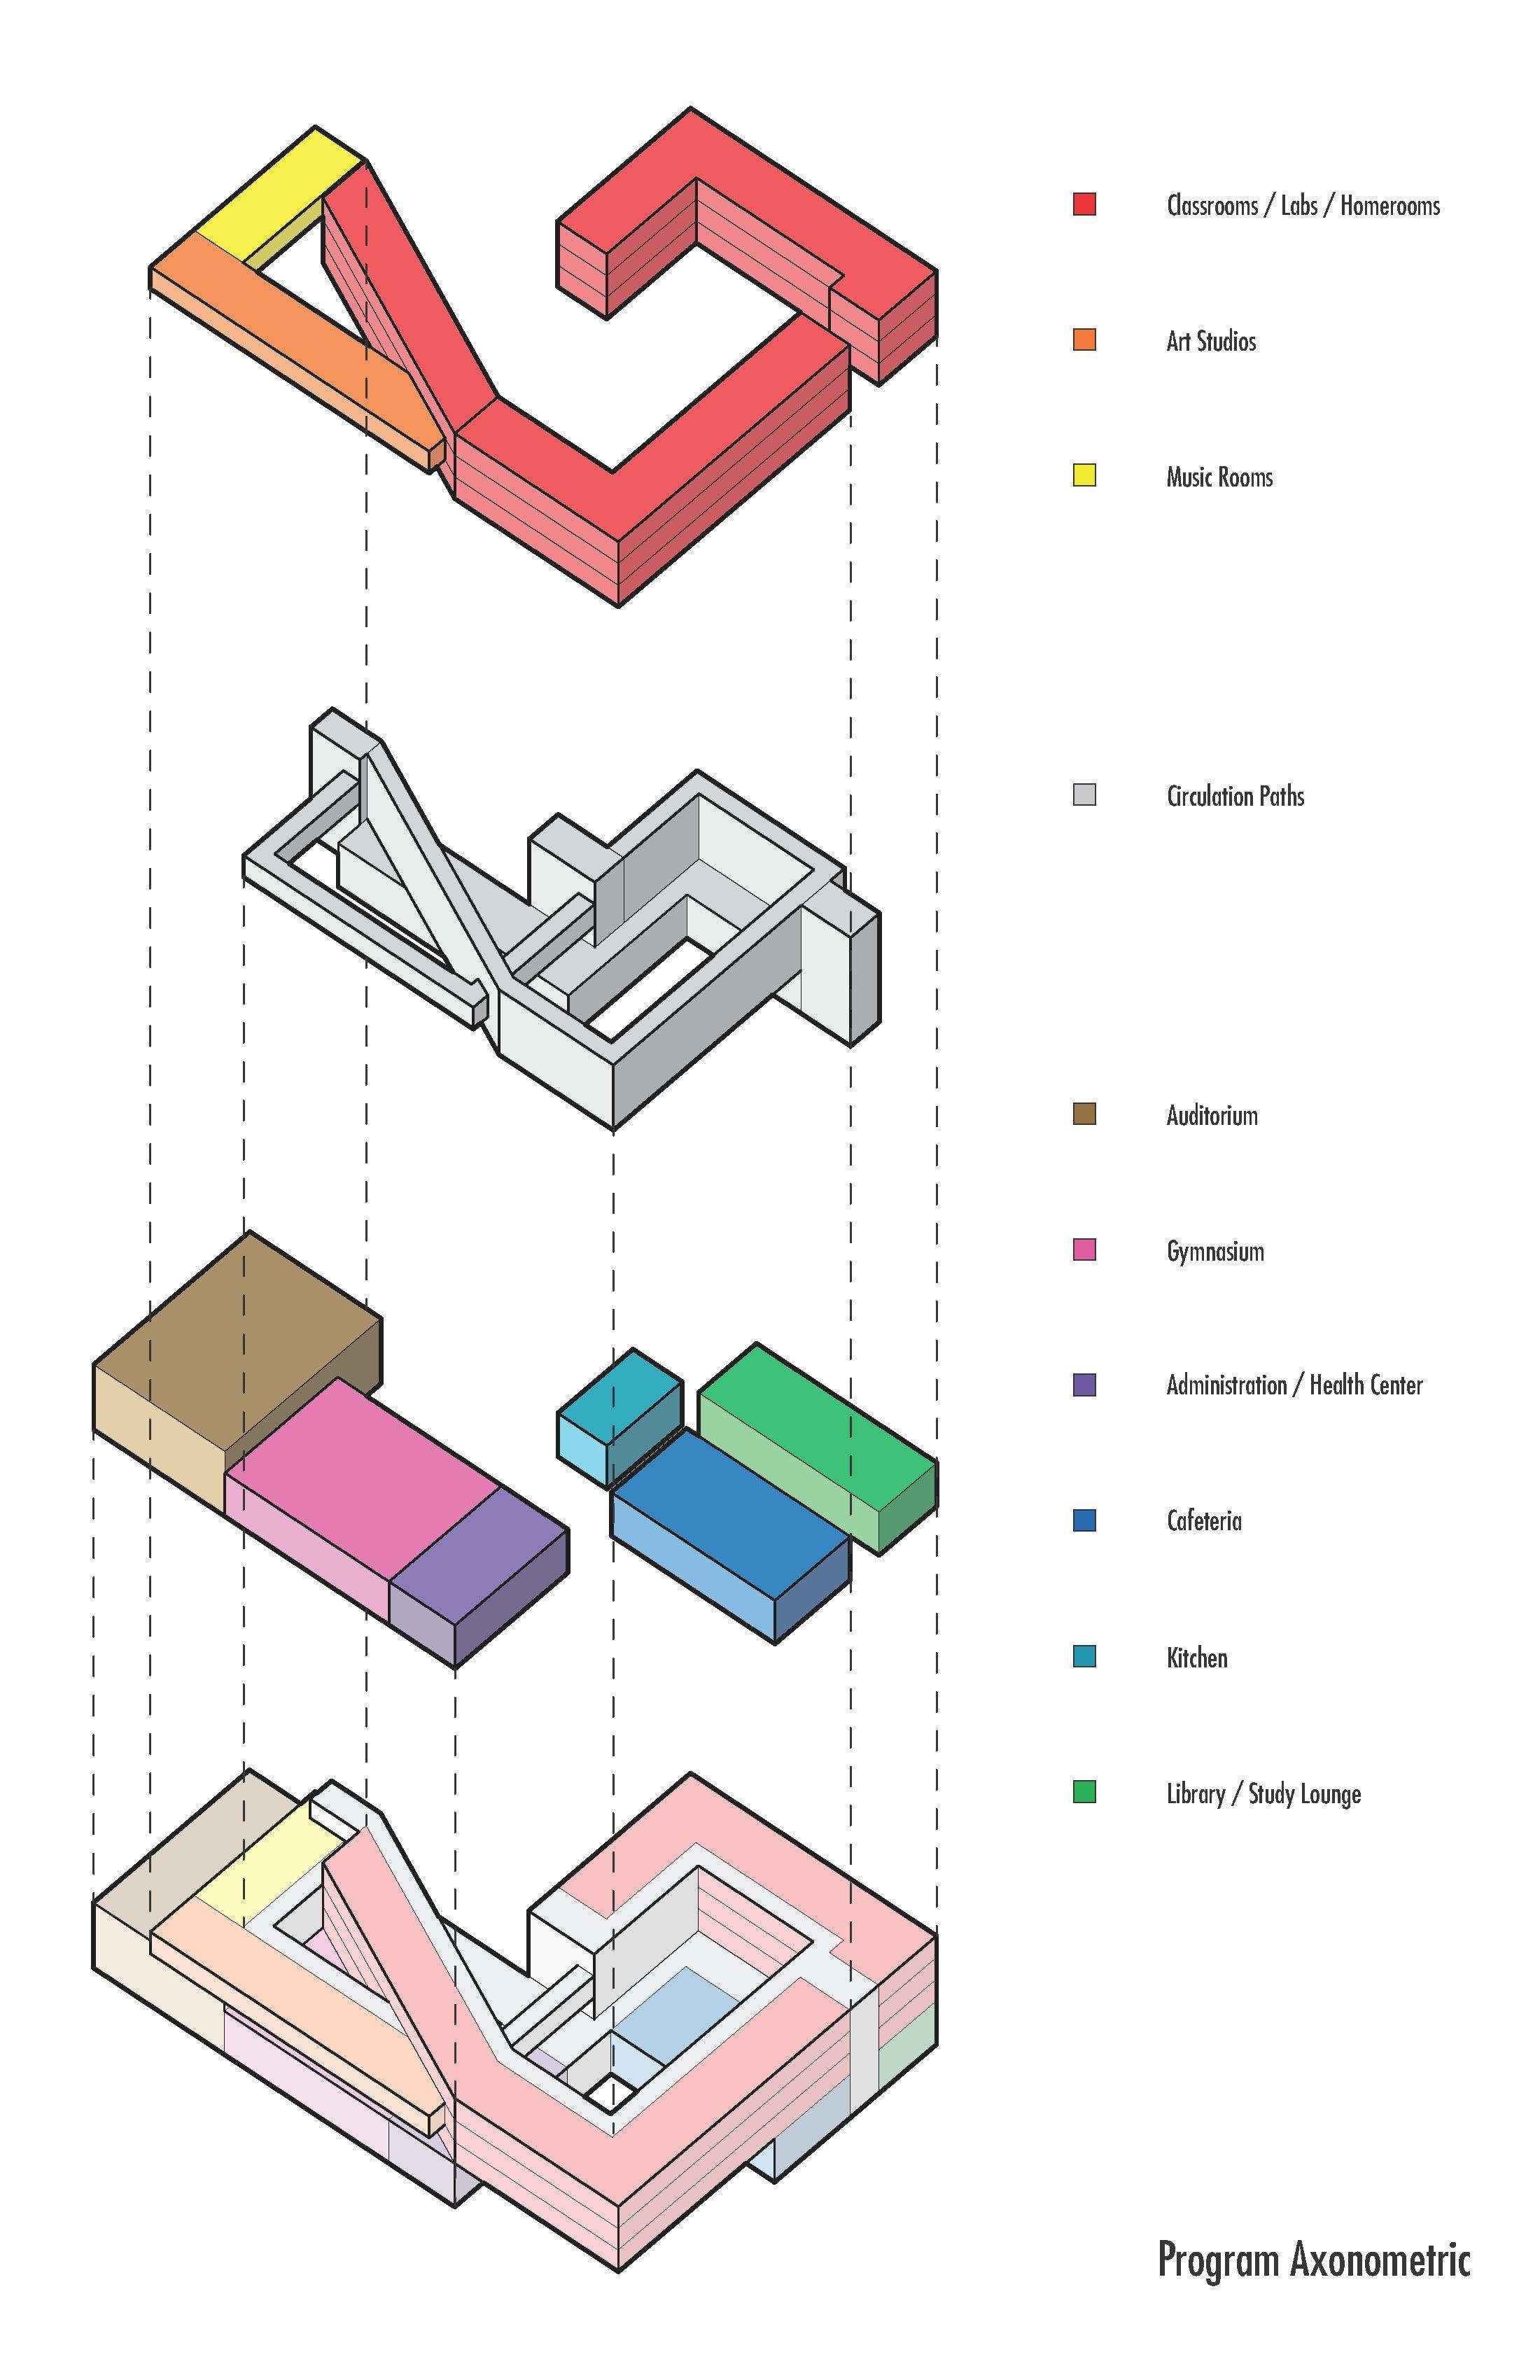 Development diagrams